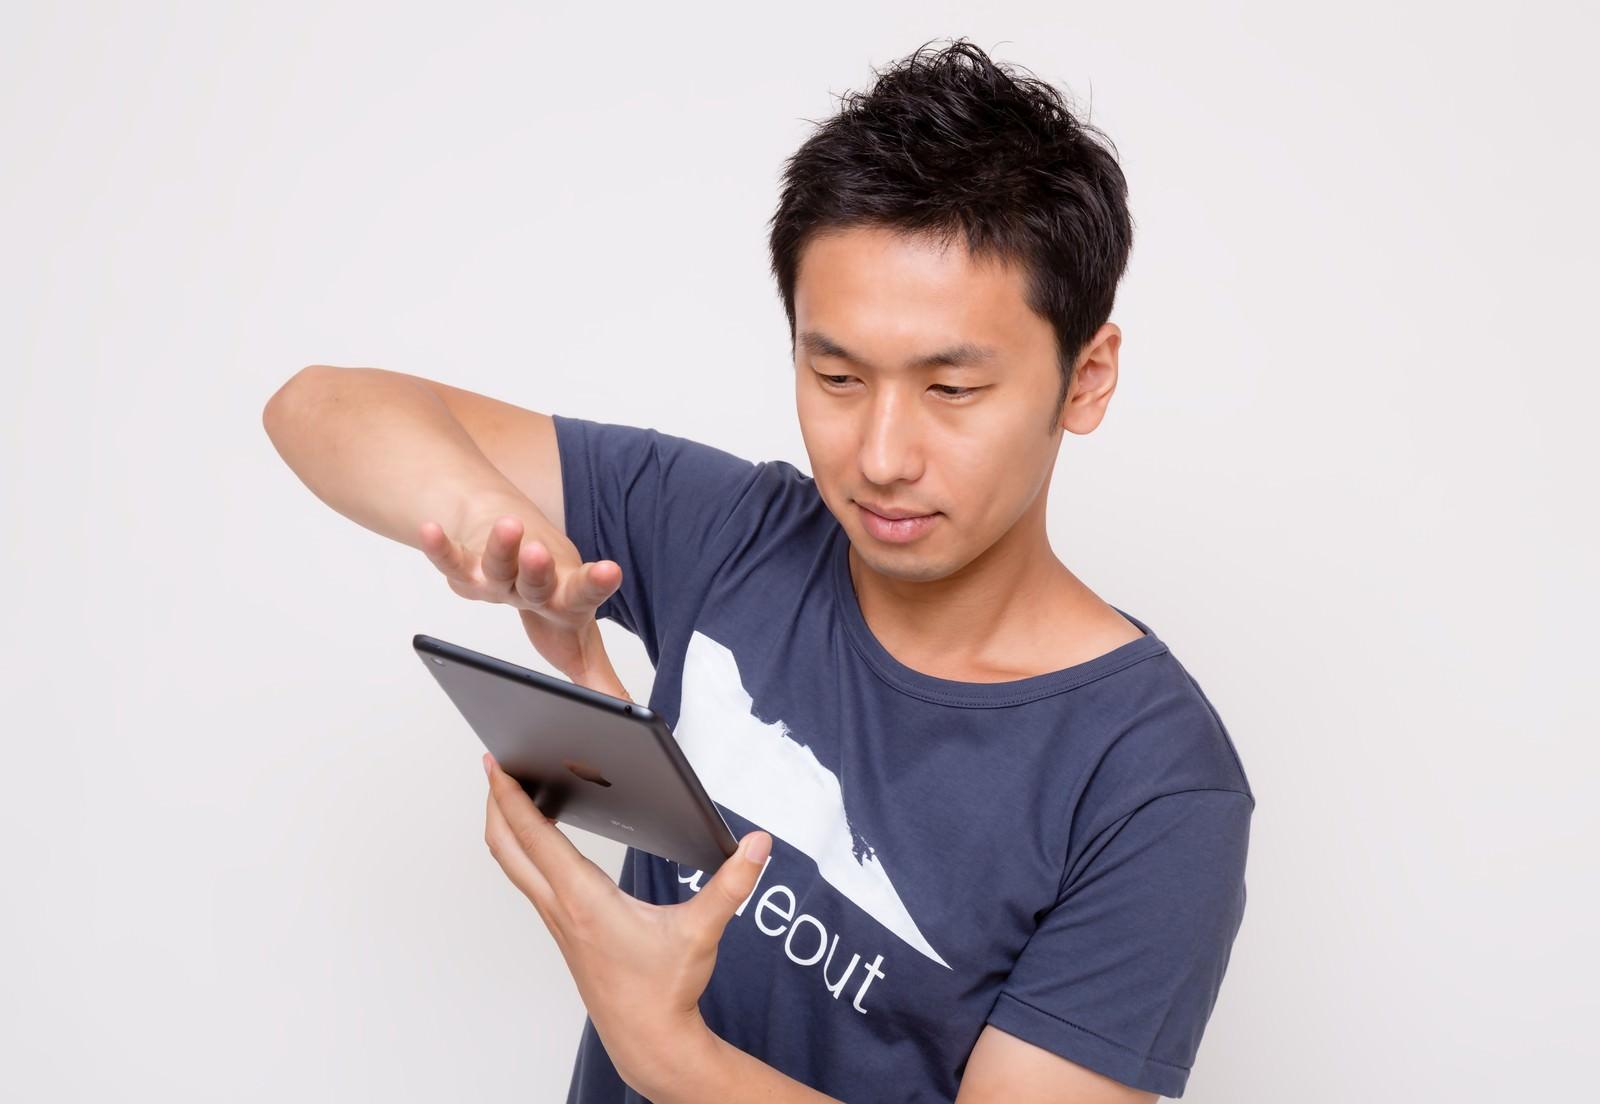 「iPad miniでスワイプする男性iPad miniでスワイプする男性」[モデル:大川竜弥]のフリー写真素材を拡大